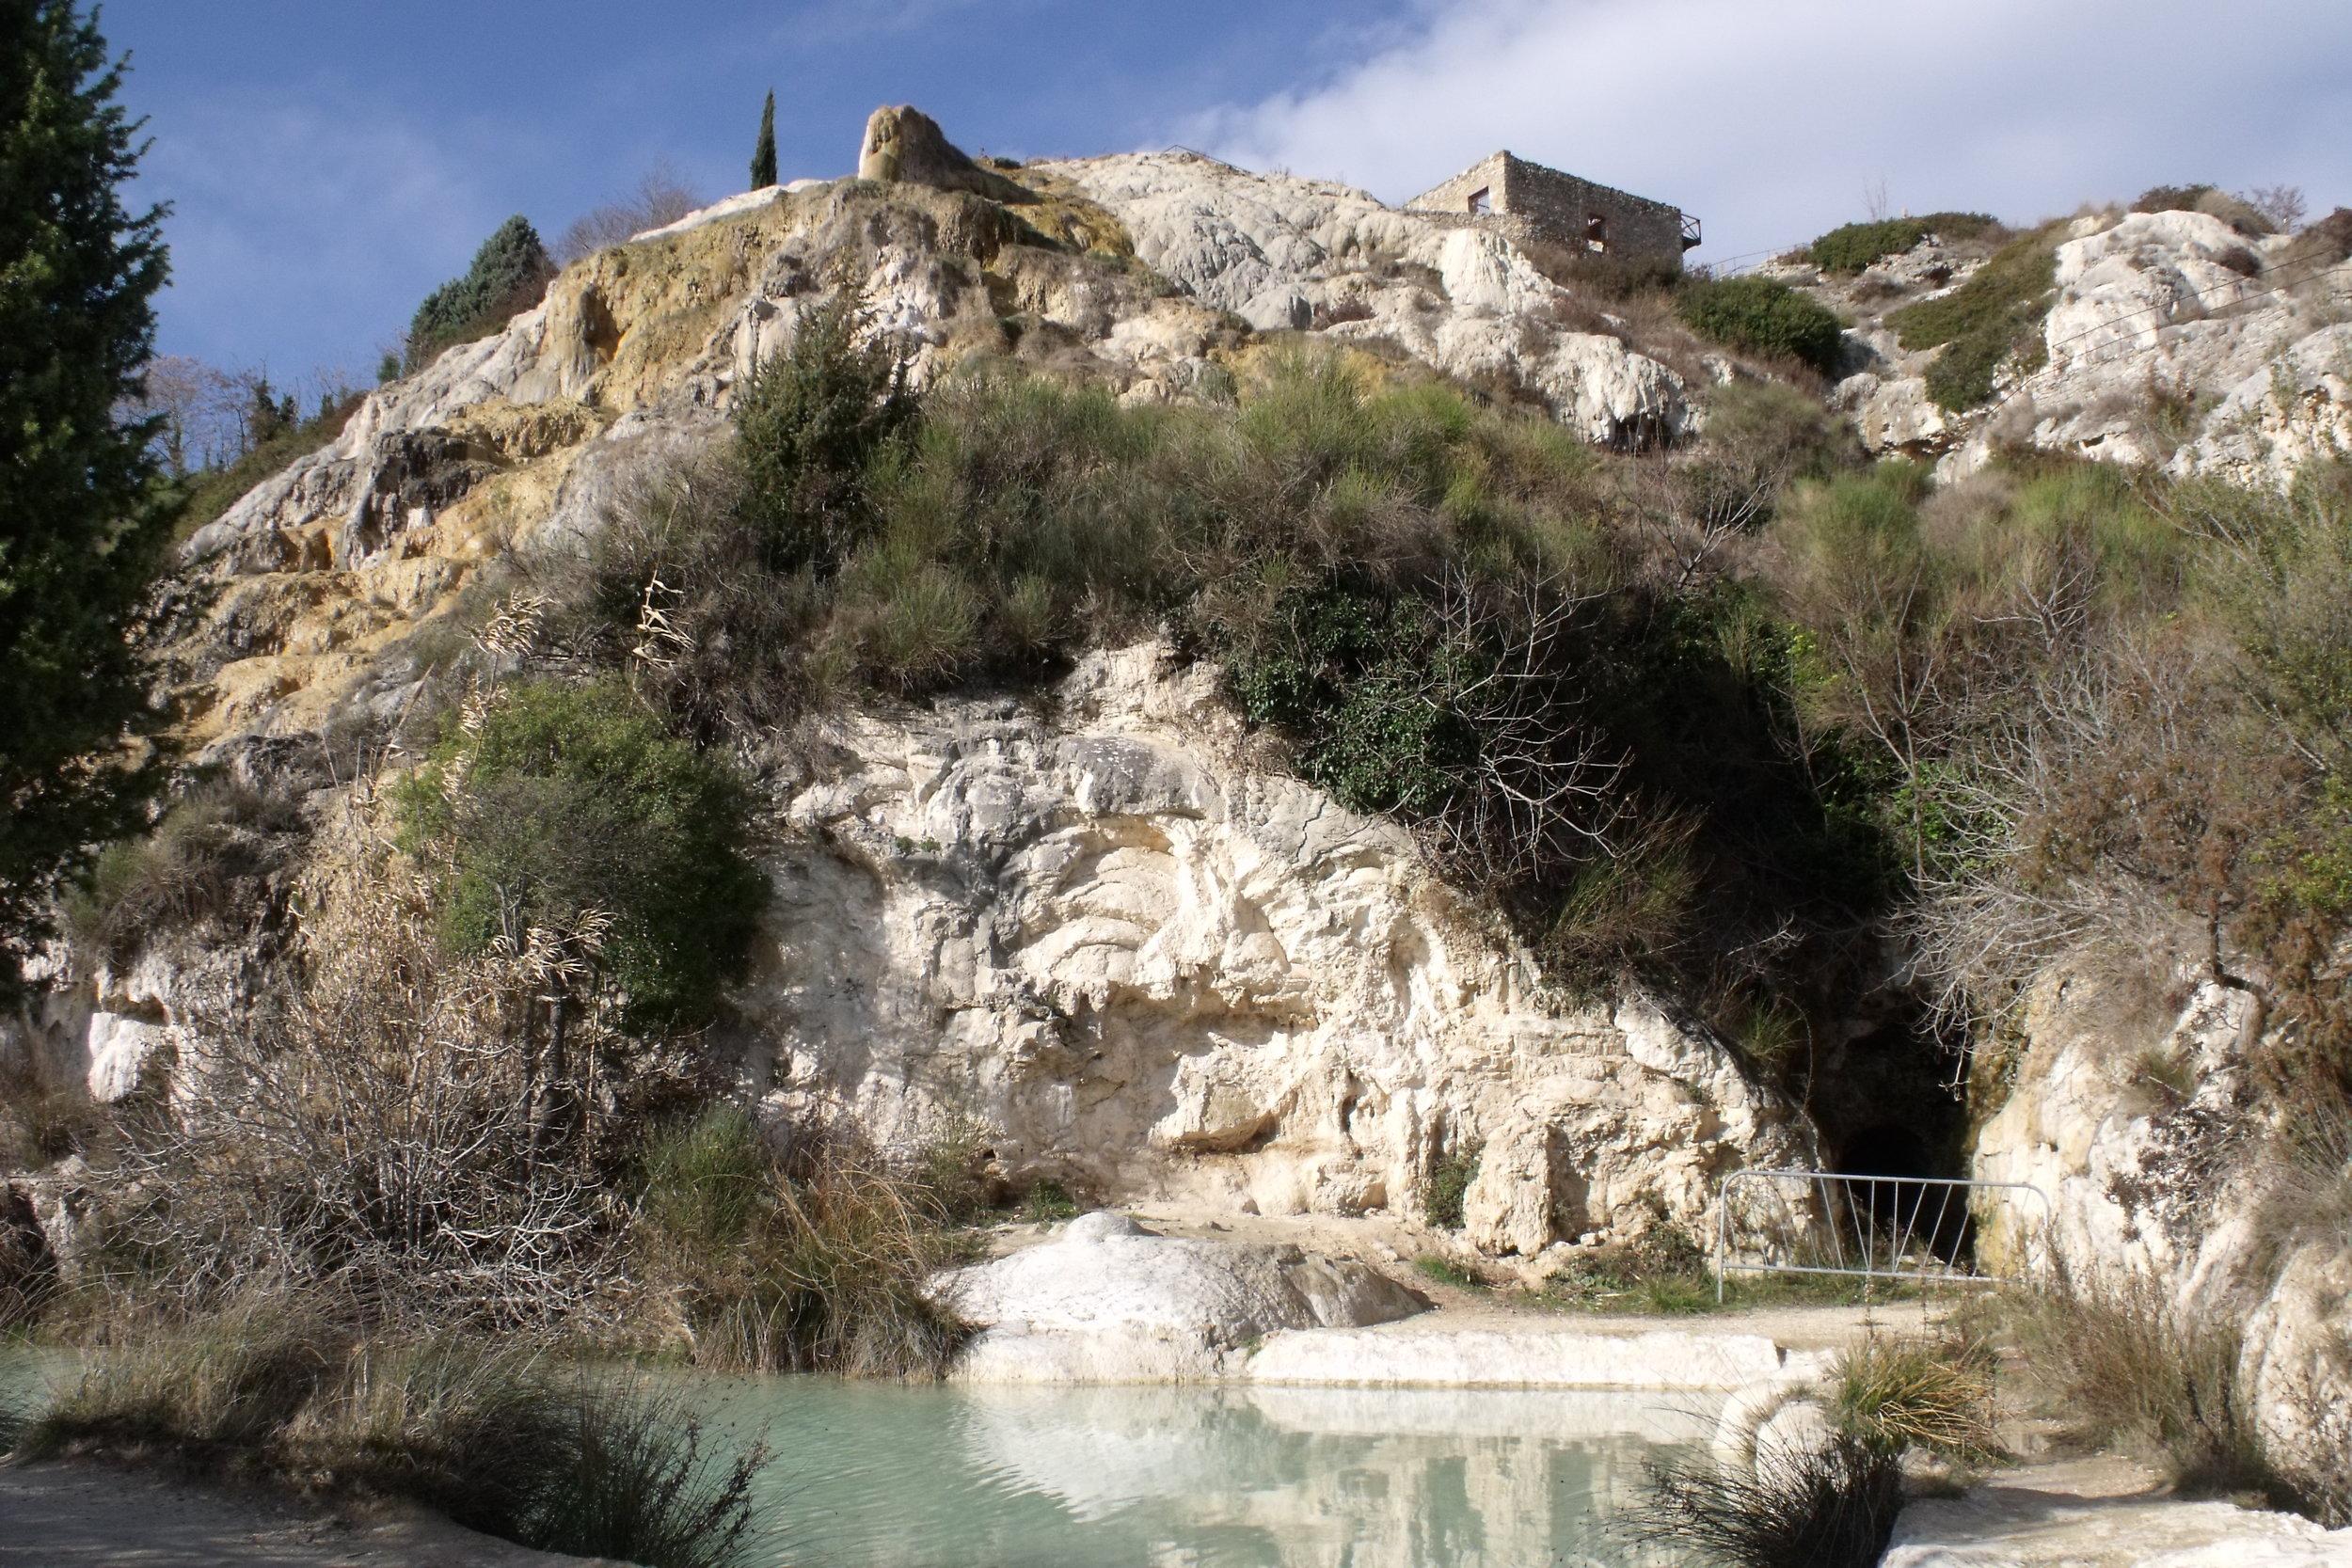 Bagno-Vignoni-thermal-springs-wellness-retreat-experience-retreats.jpg